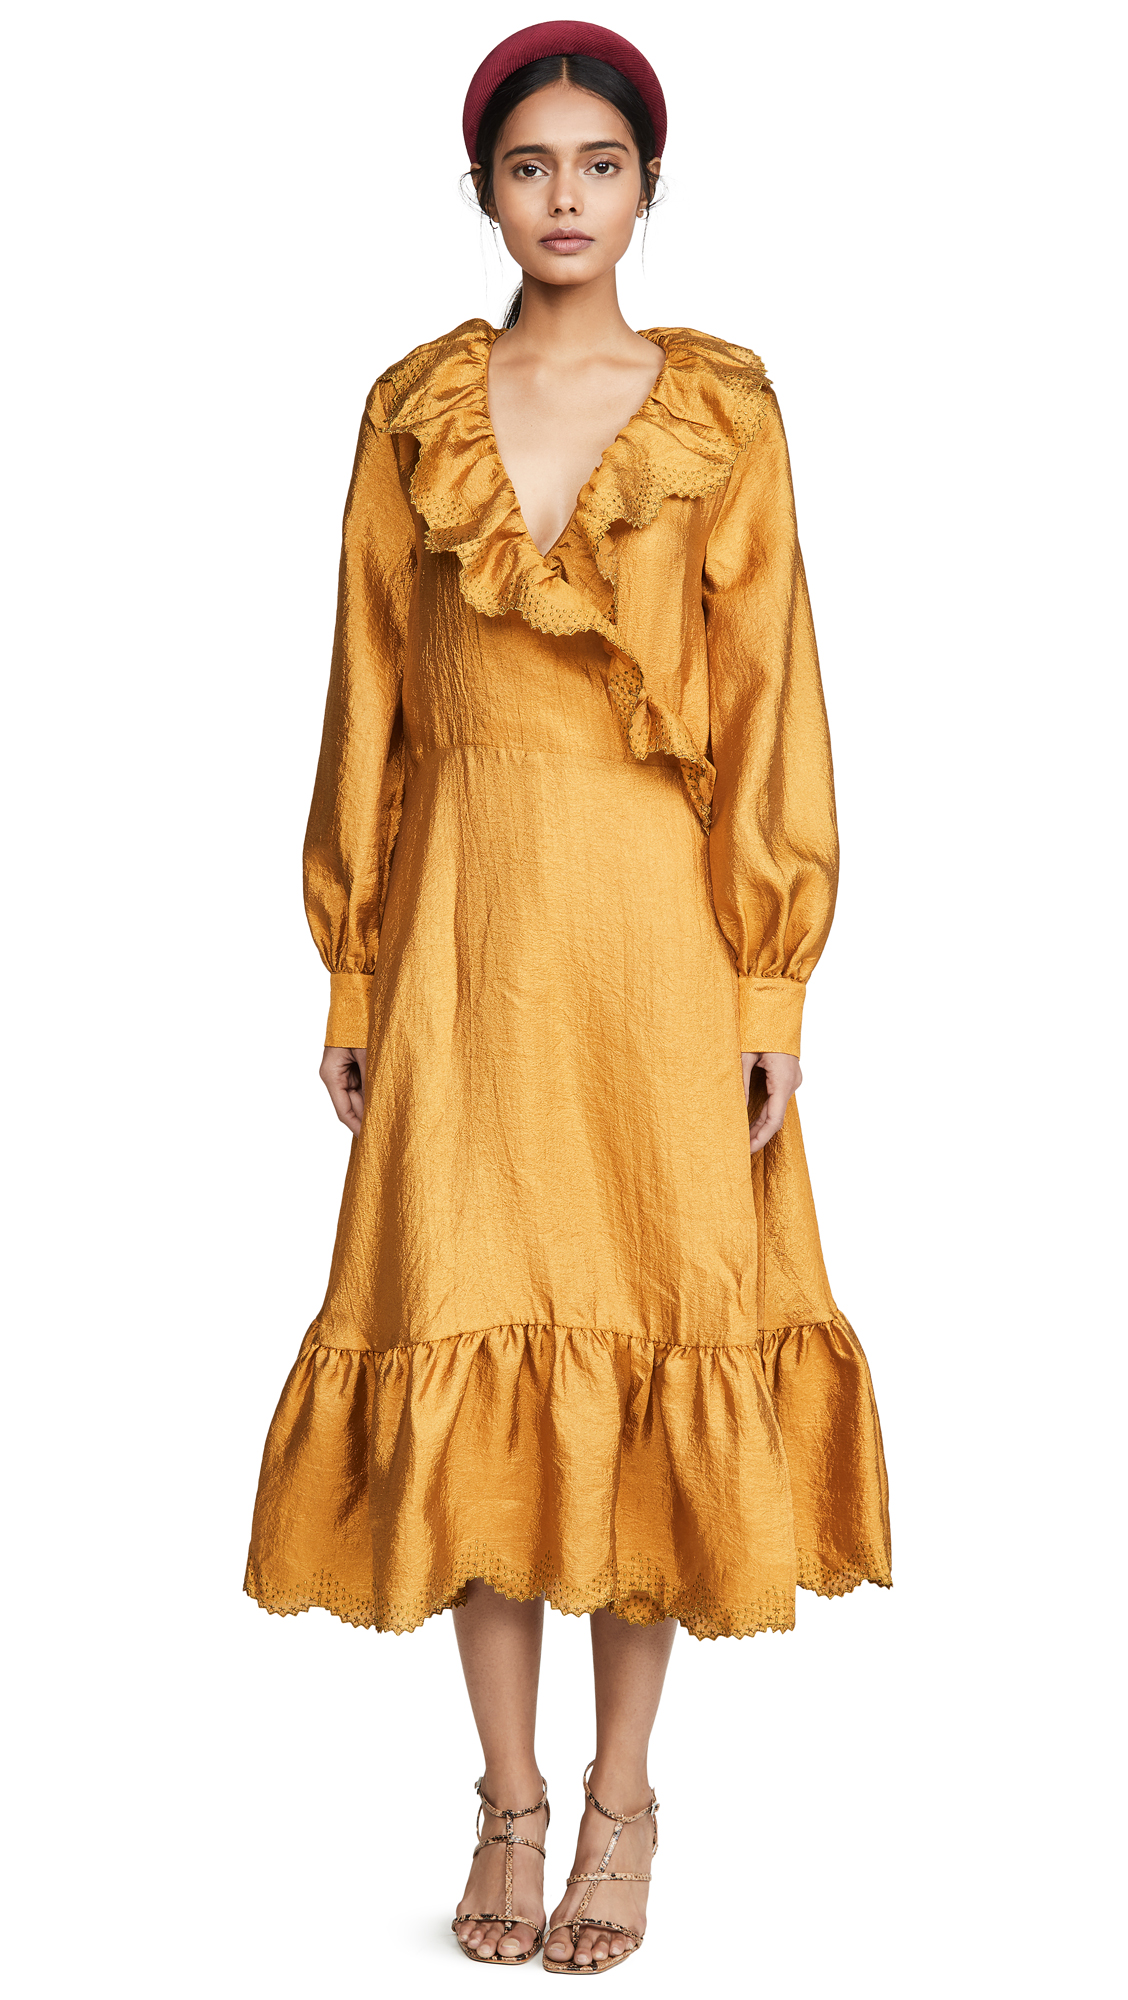 Stine Goya Steffi Dress - 60% Off Sale